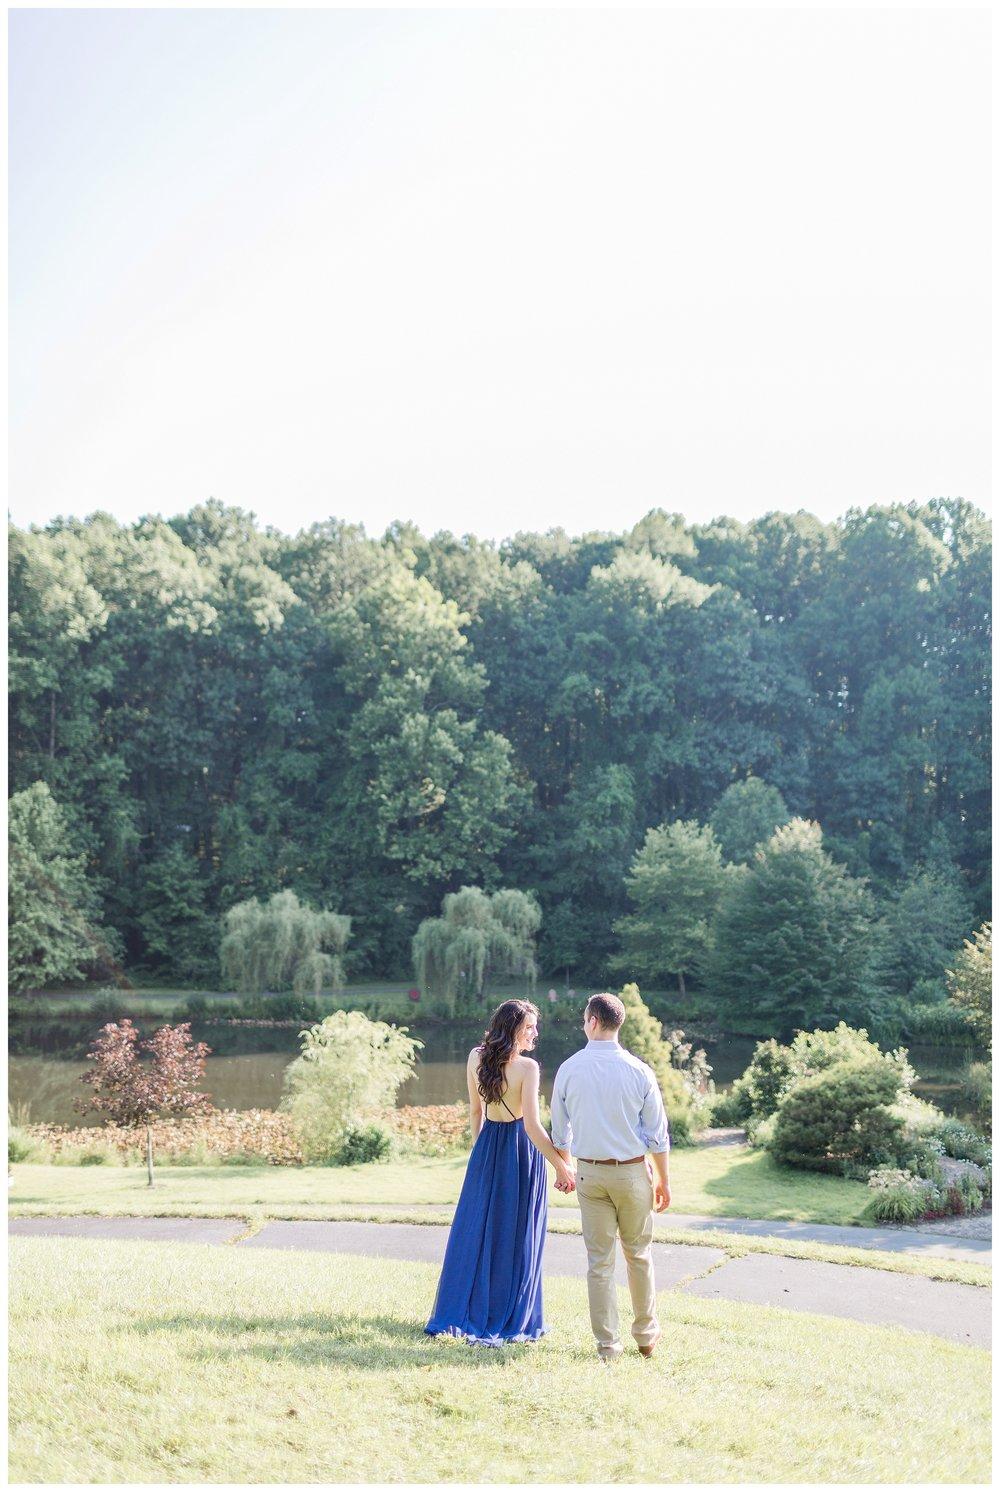 Meadowlark Botanical Garden Engagement | Virginia Wedding Photographer Kir Tuben_0011.jpg